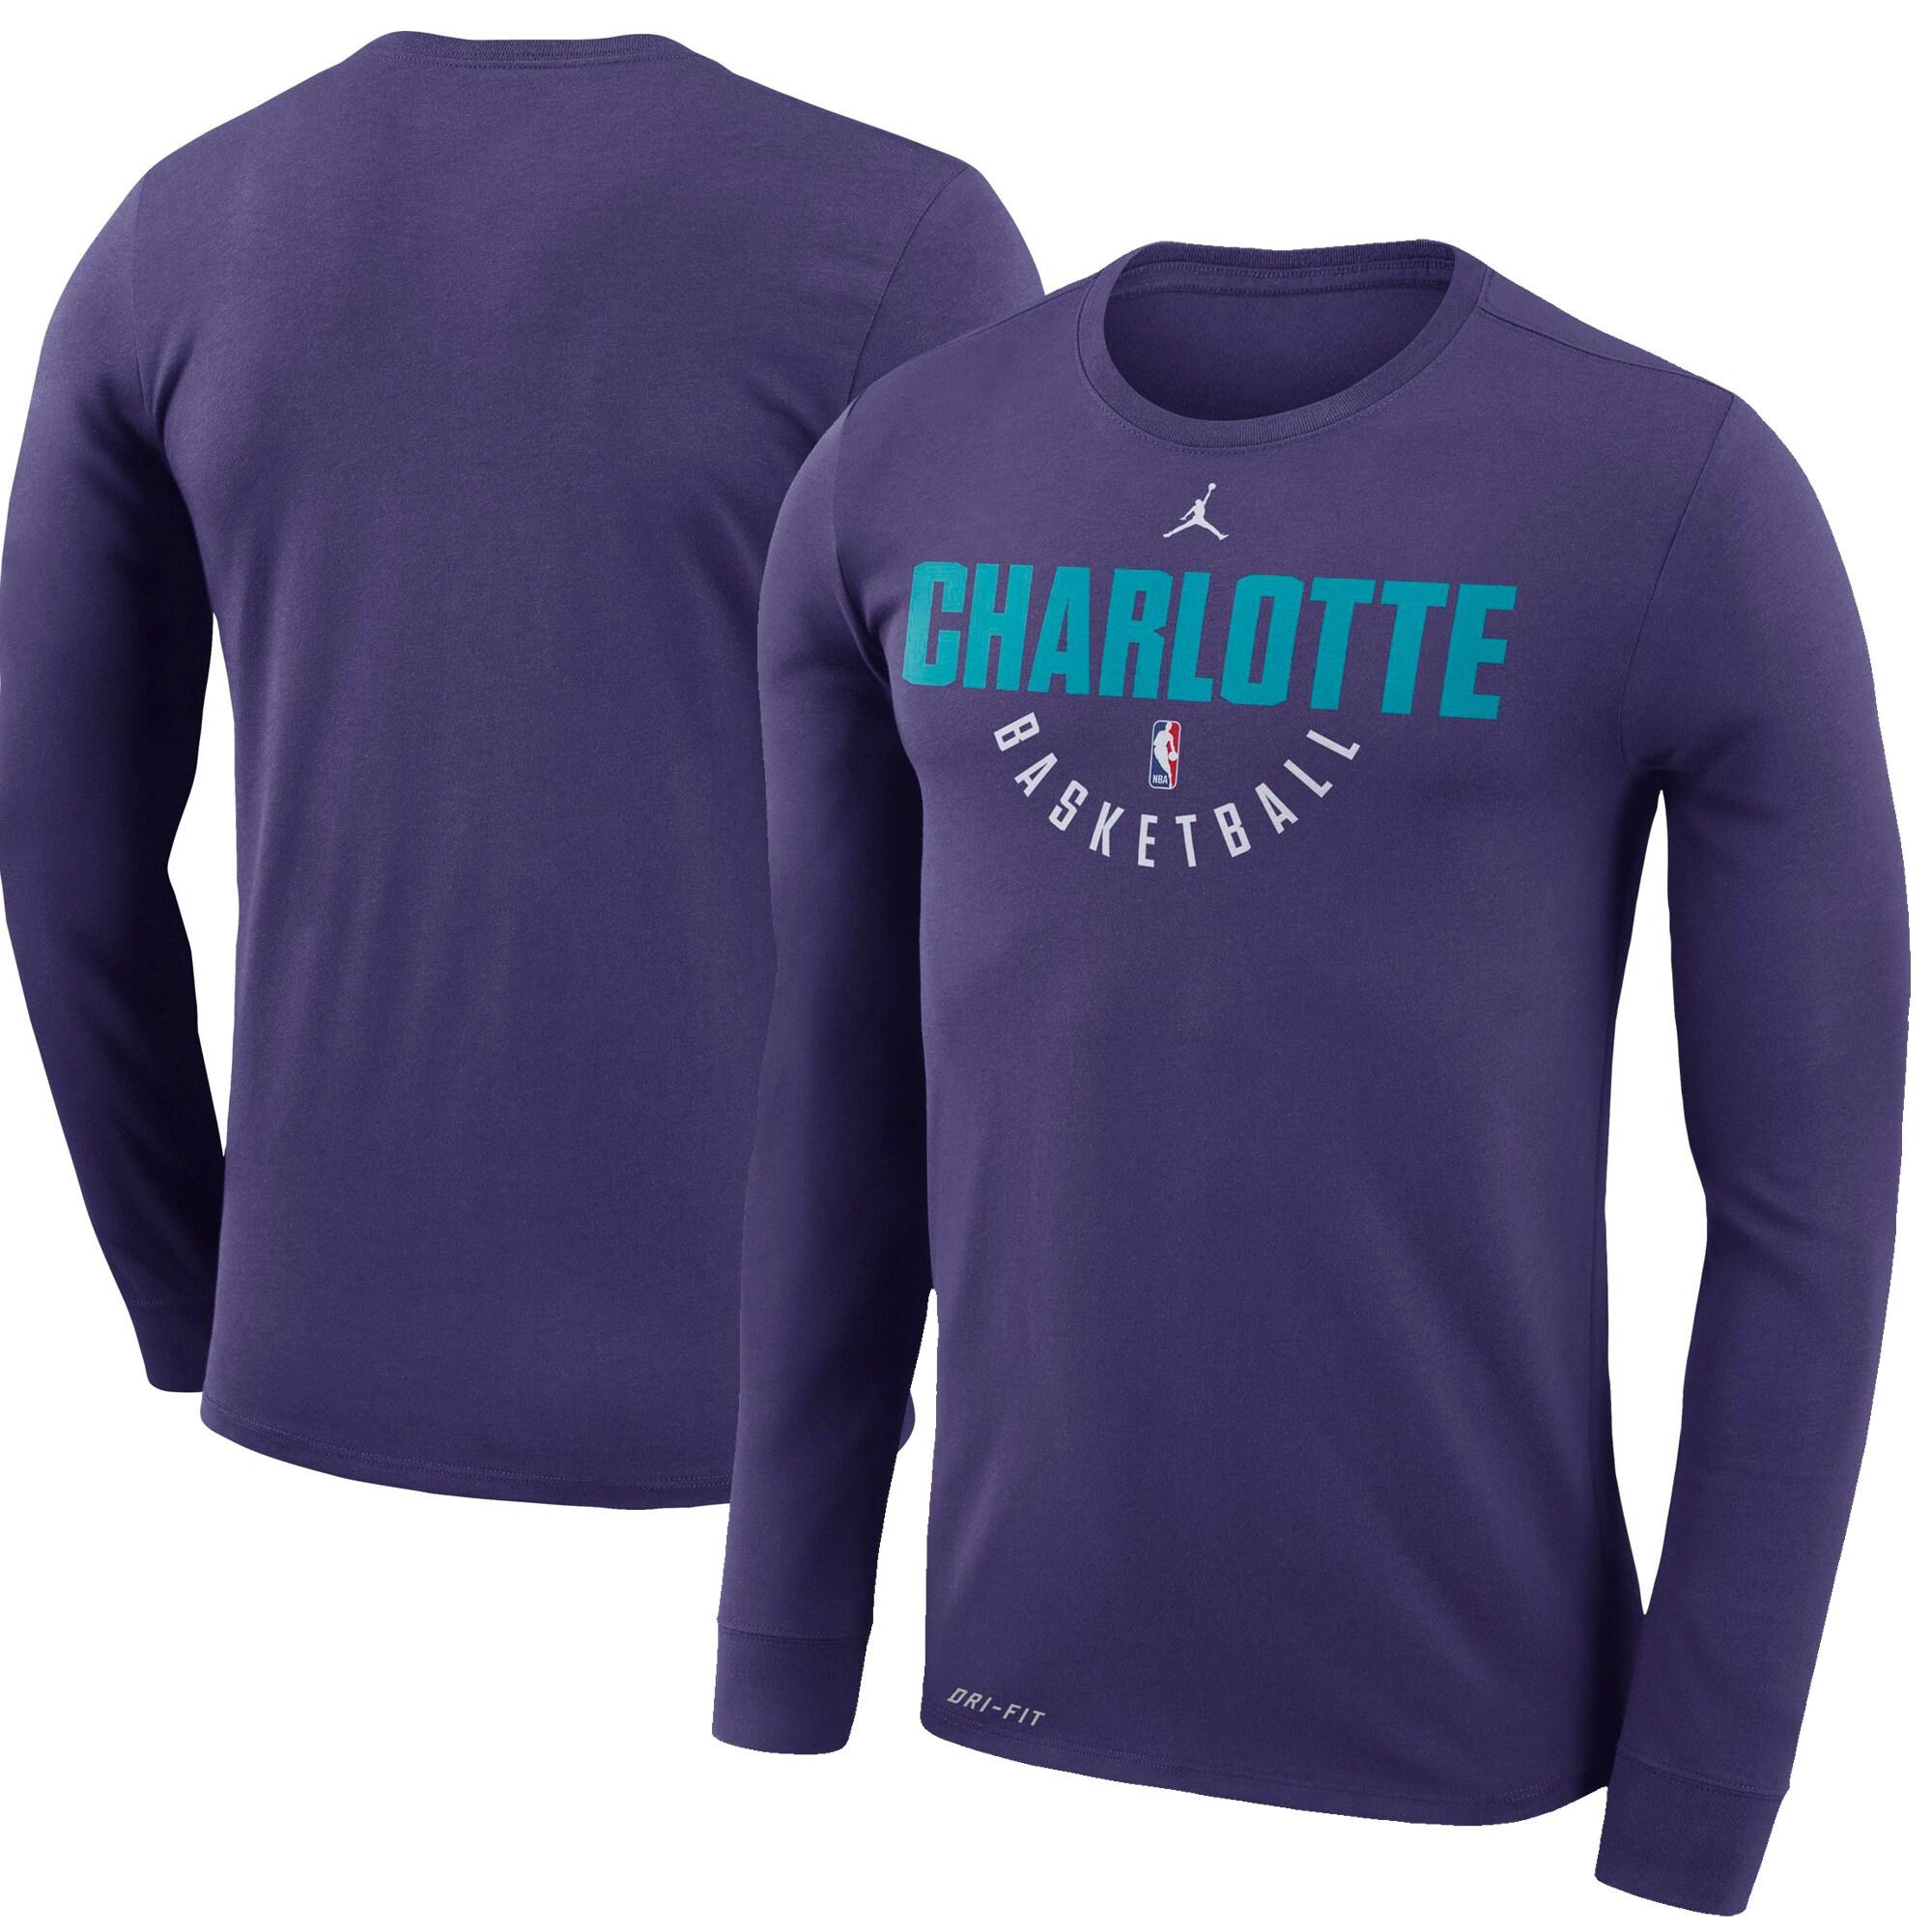 Charlotte Hornets Jordan Brand Practice Long Sleeve Performance T-Shirt - Purple